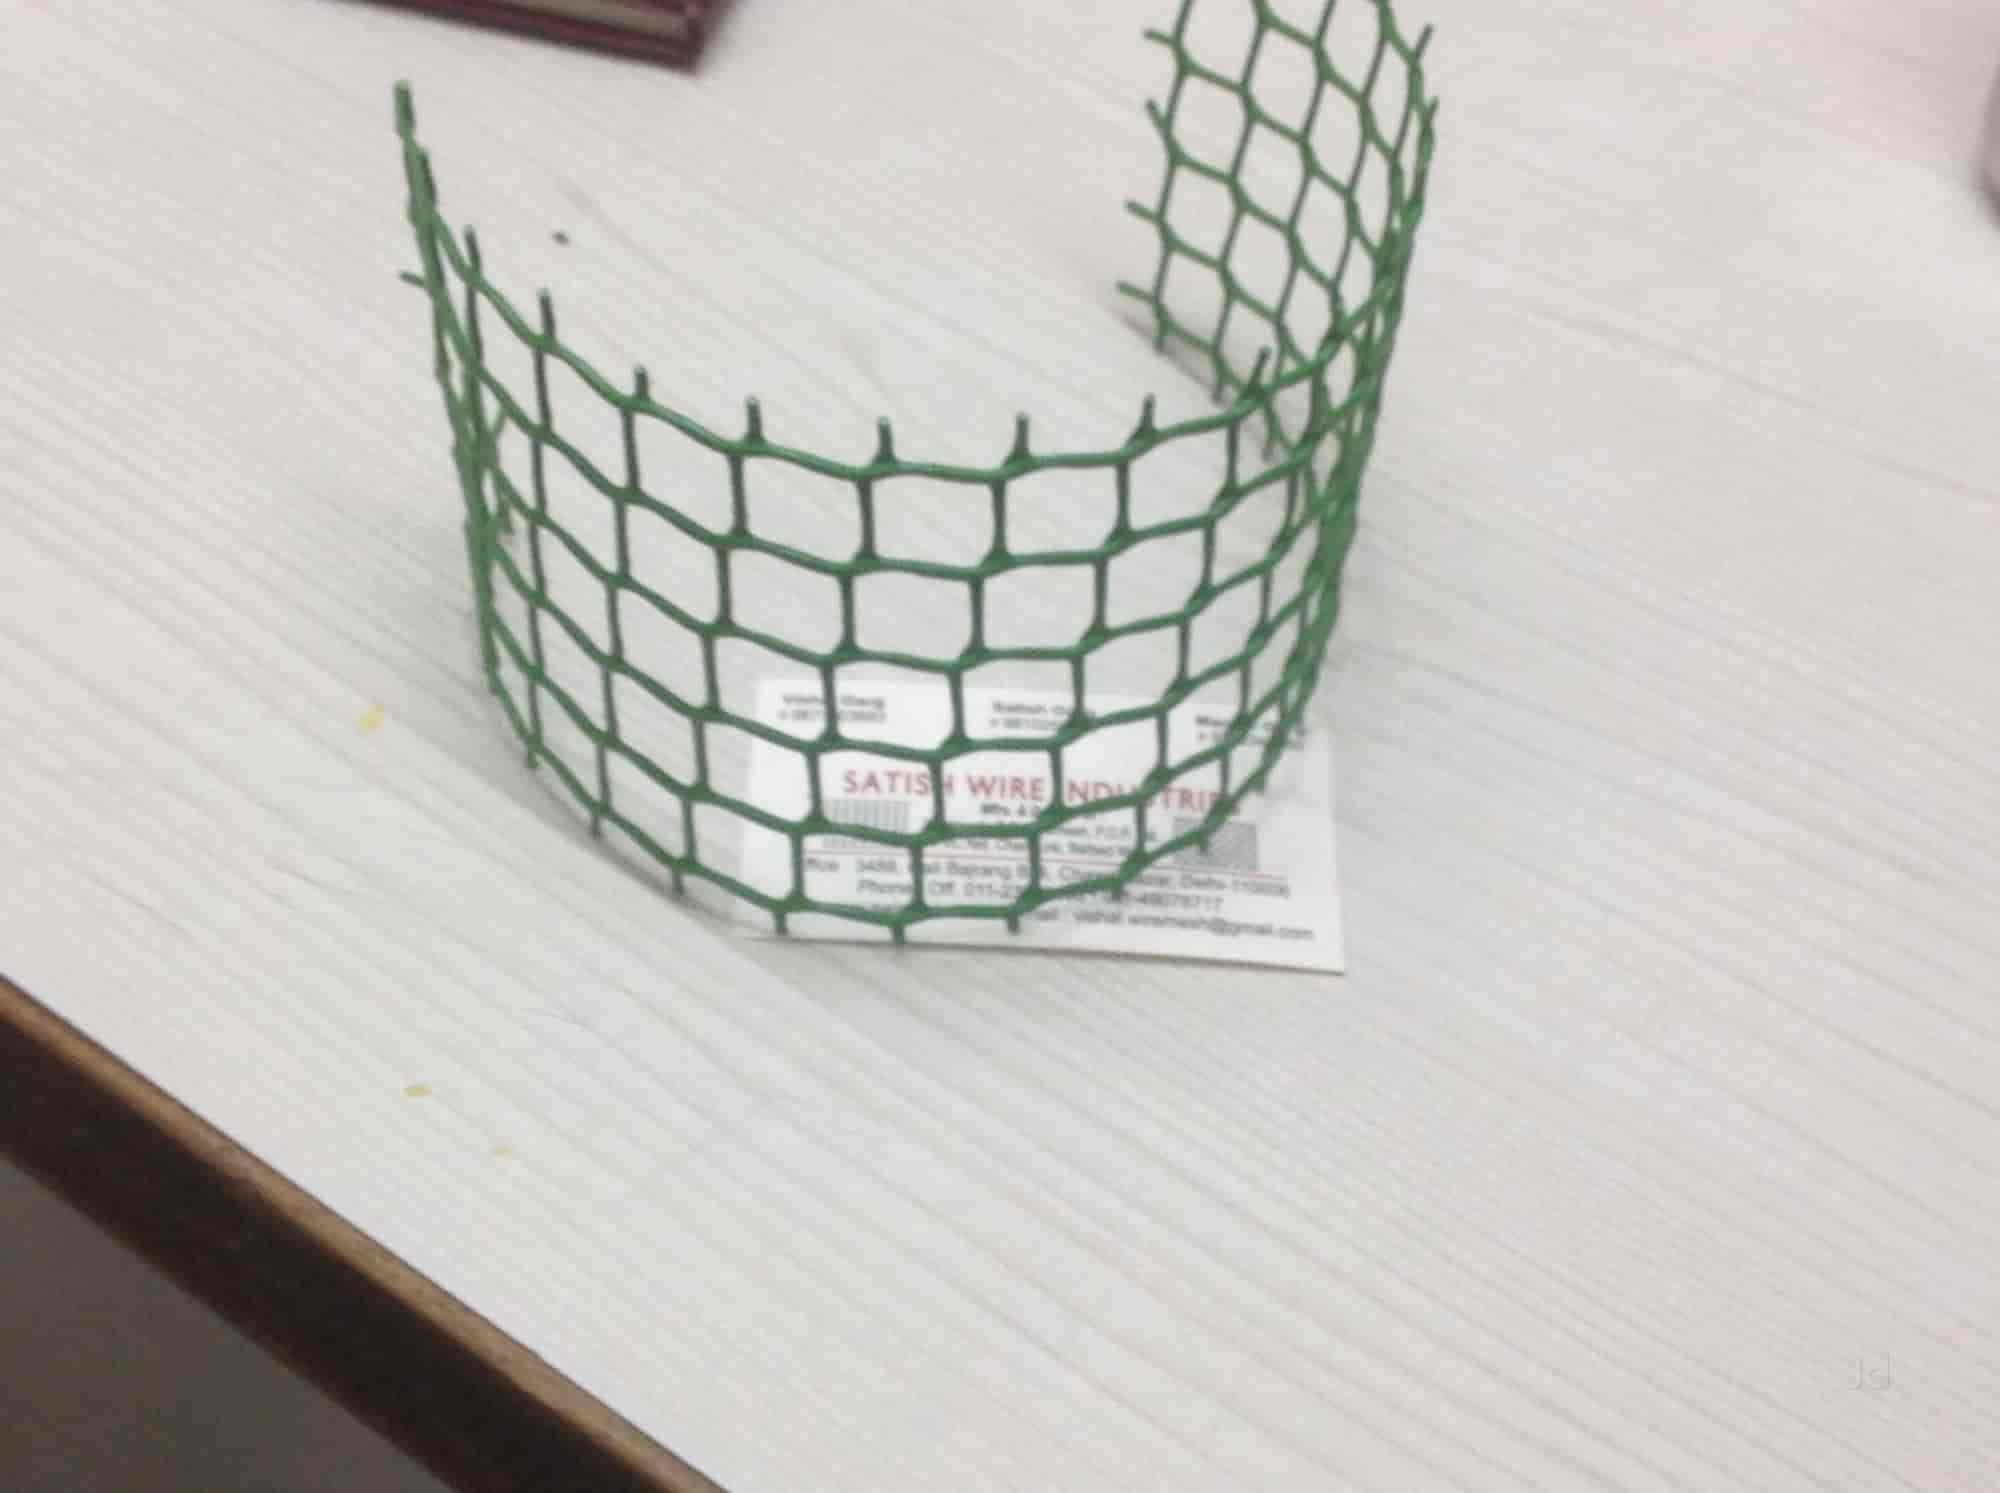 Satish Wire Industries, Chawri Bazar - Wire Netting Dealers in ...